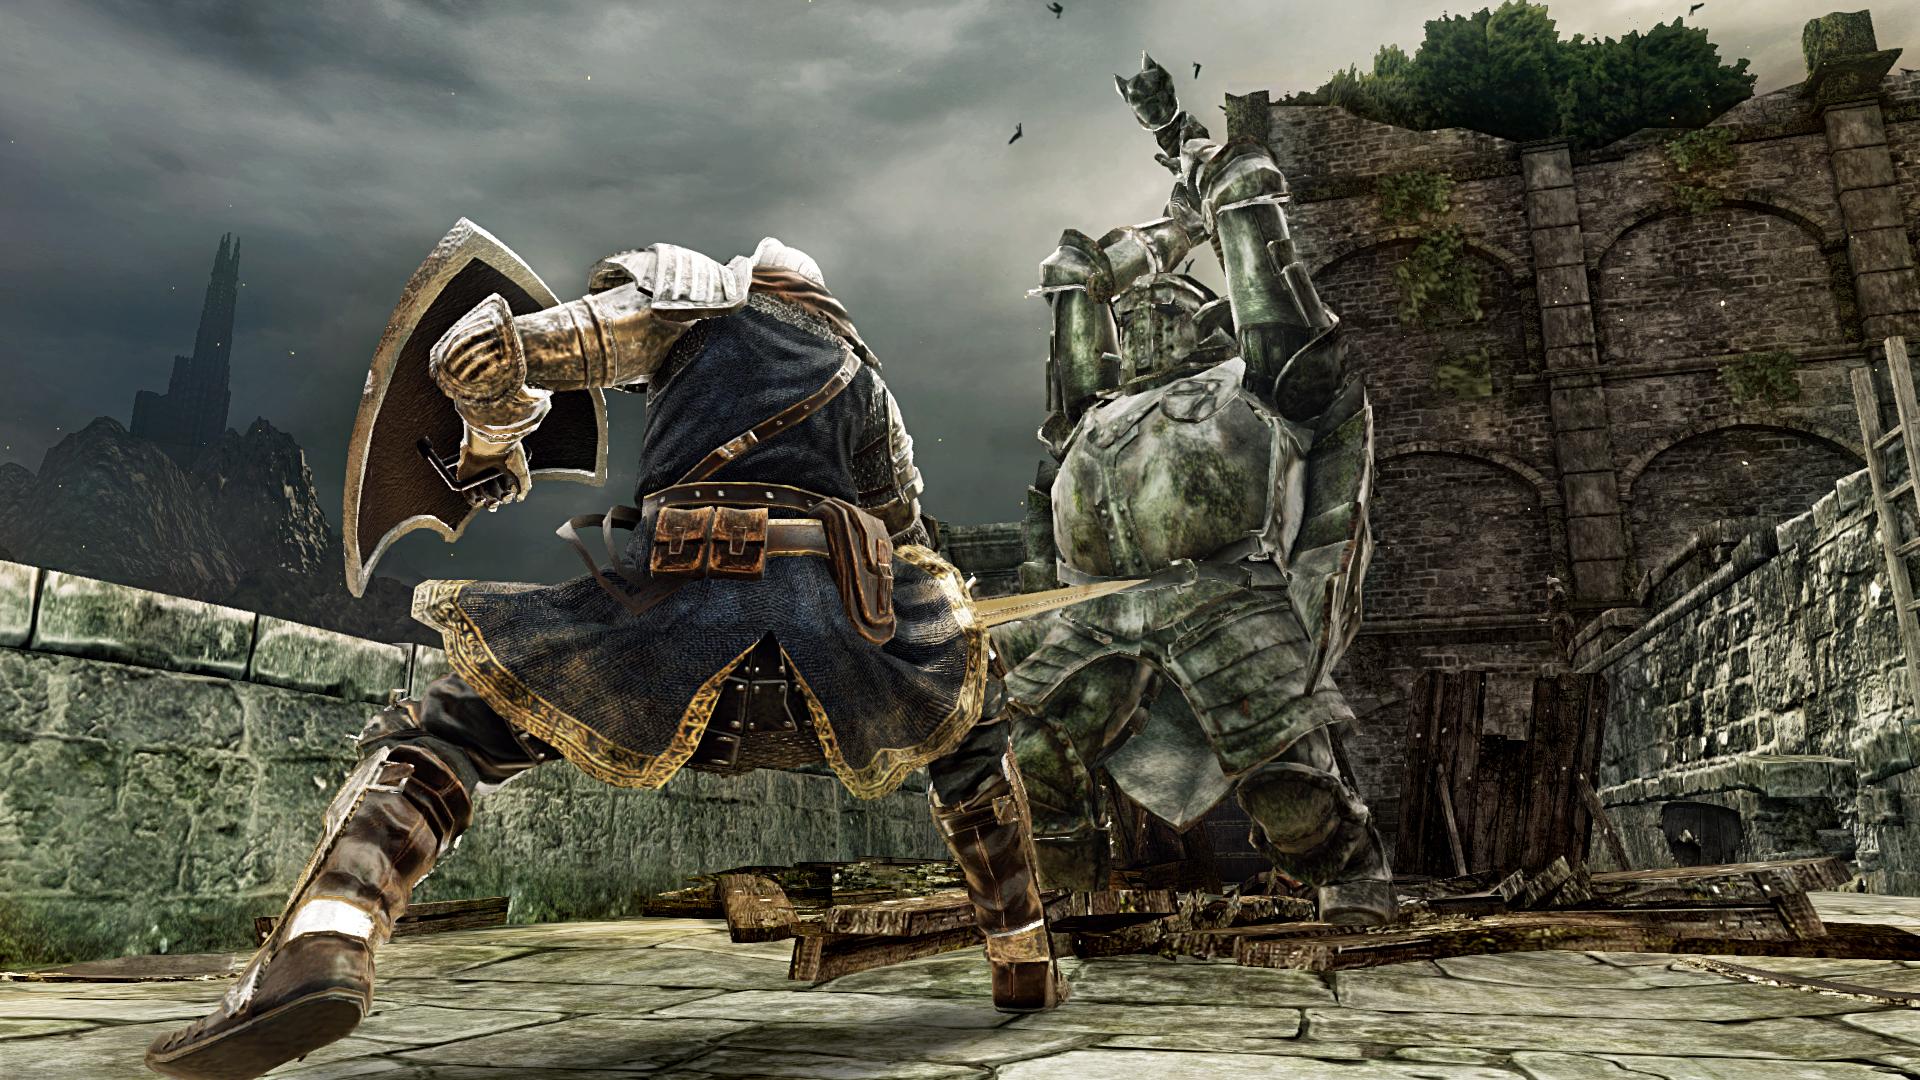 Obrazem: Temné dungeony, kostlivci a monstra z Dark Souls 2: Scholar of the First Sin 107551